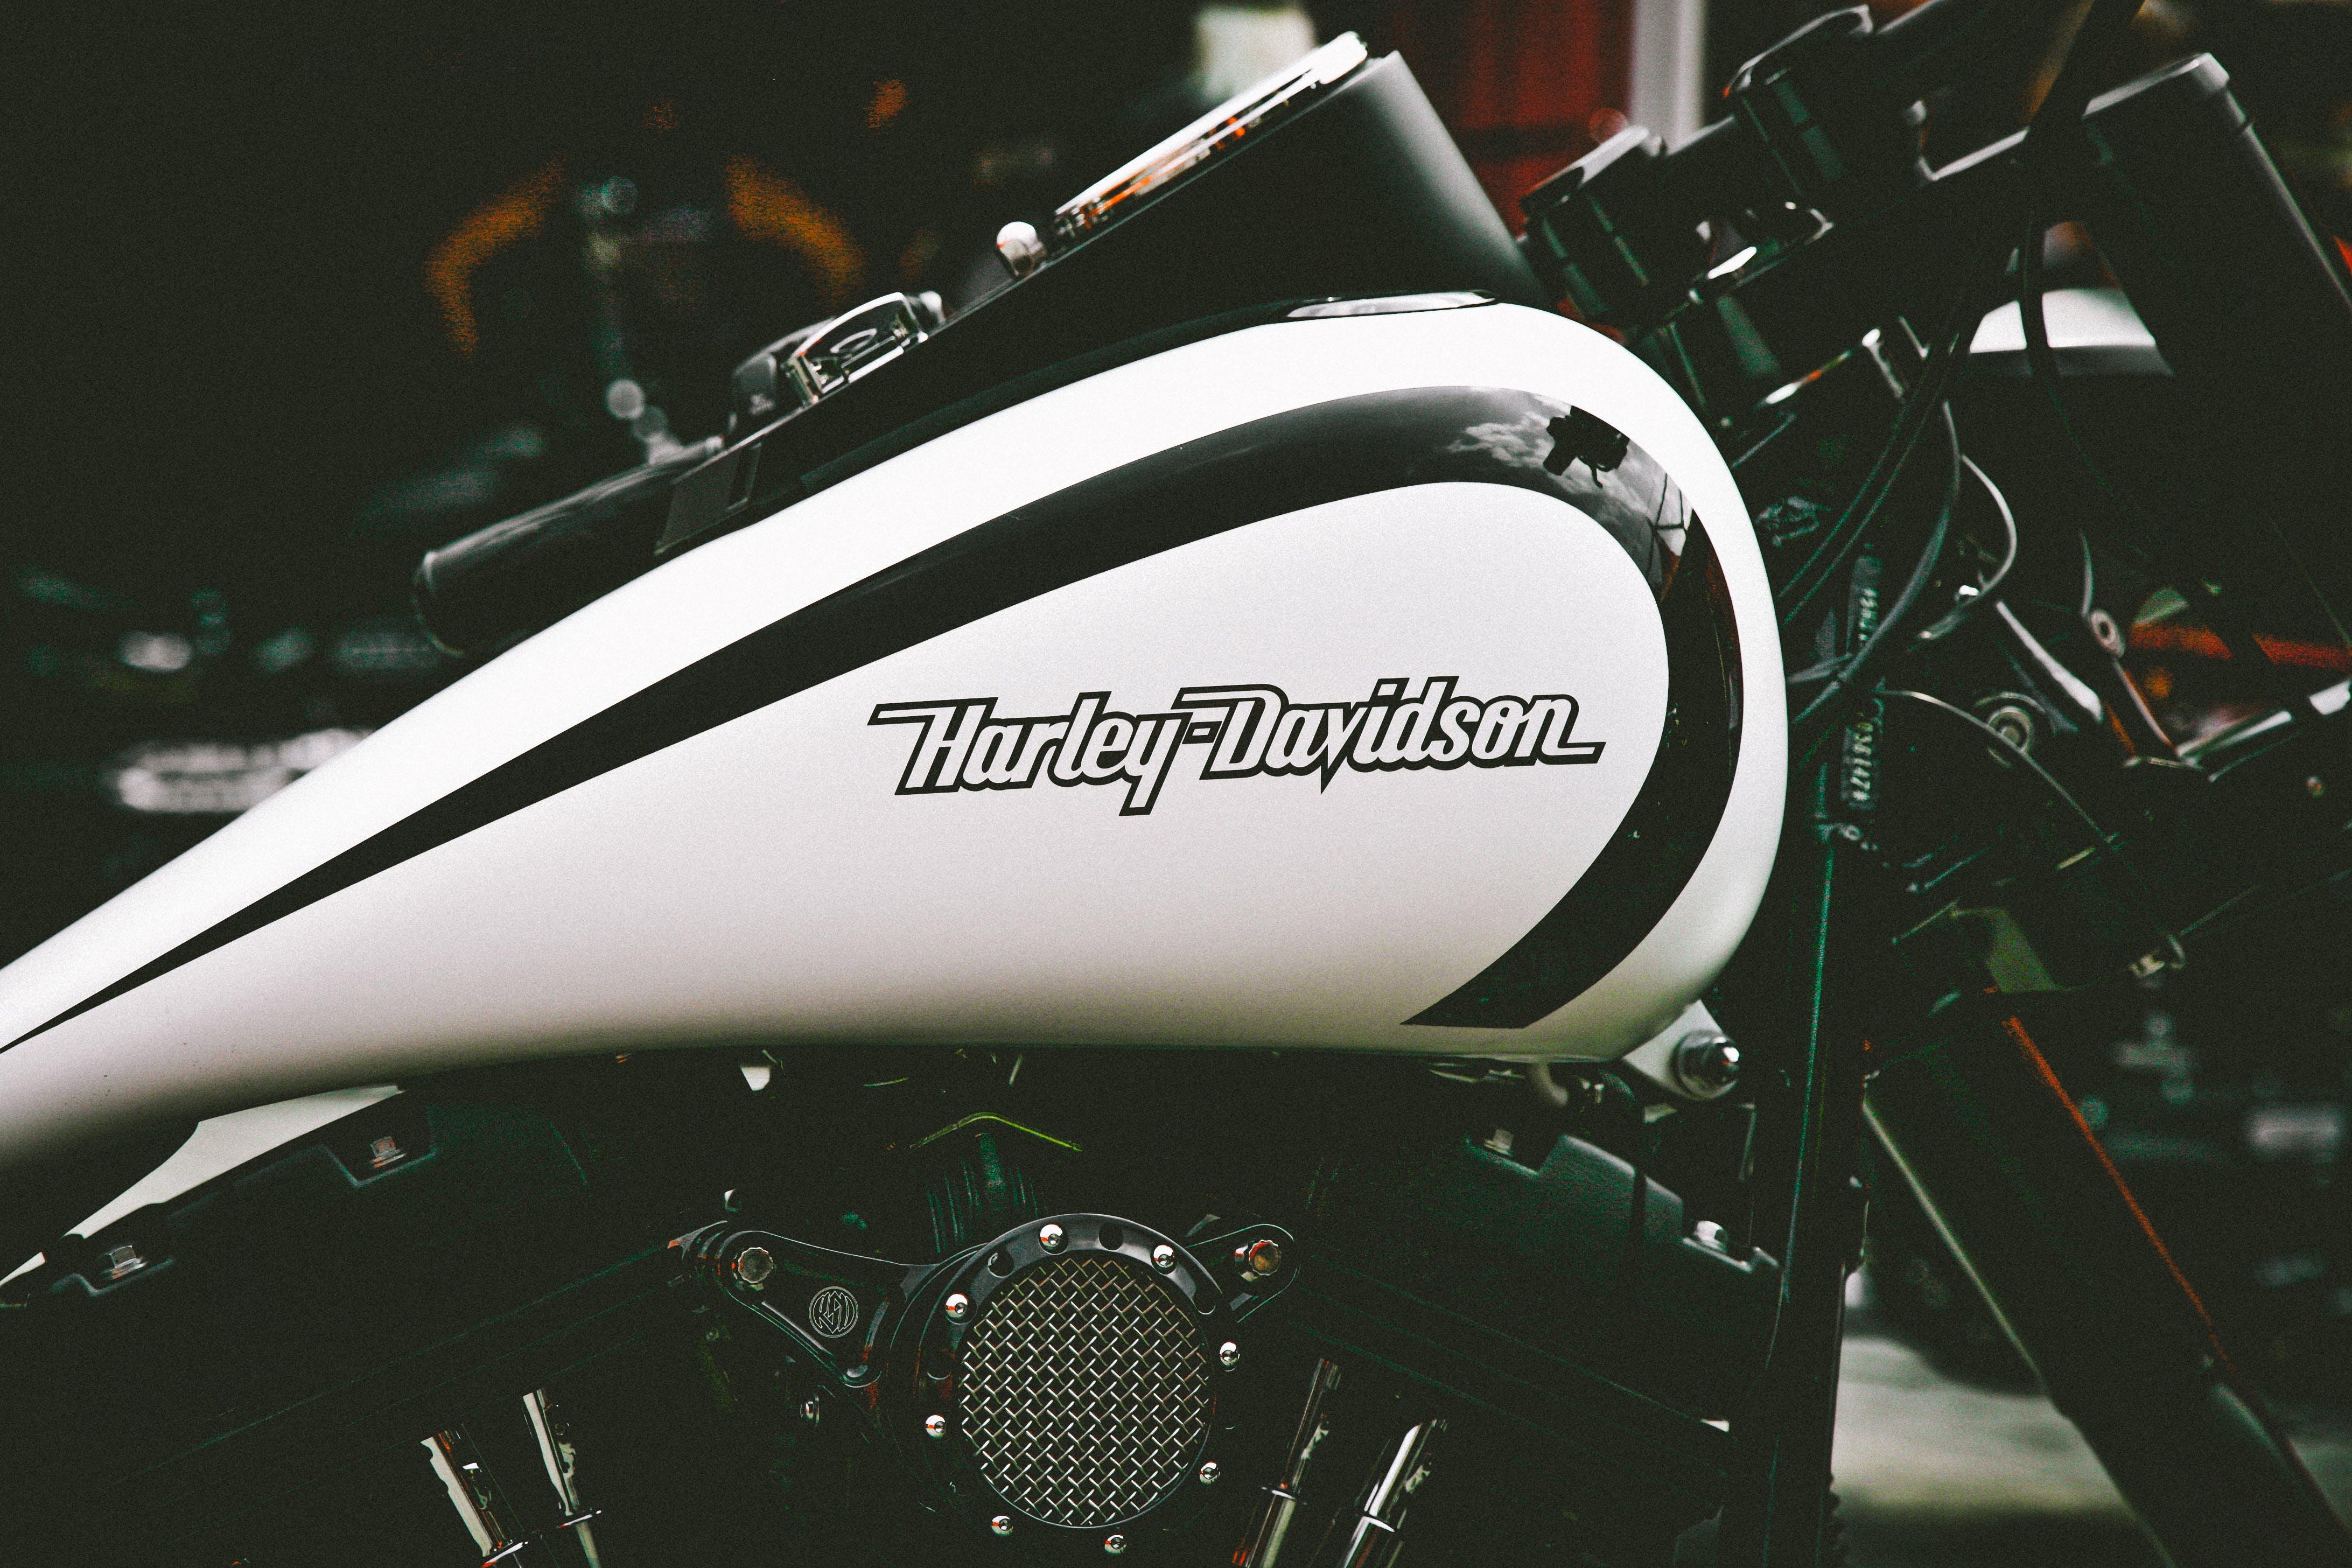 Black and White Harley Davidson Motorbike